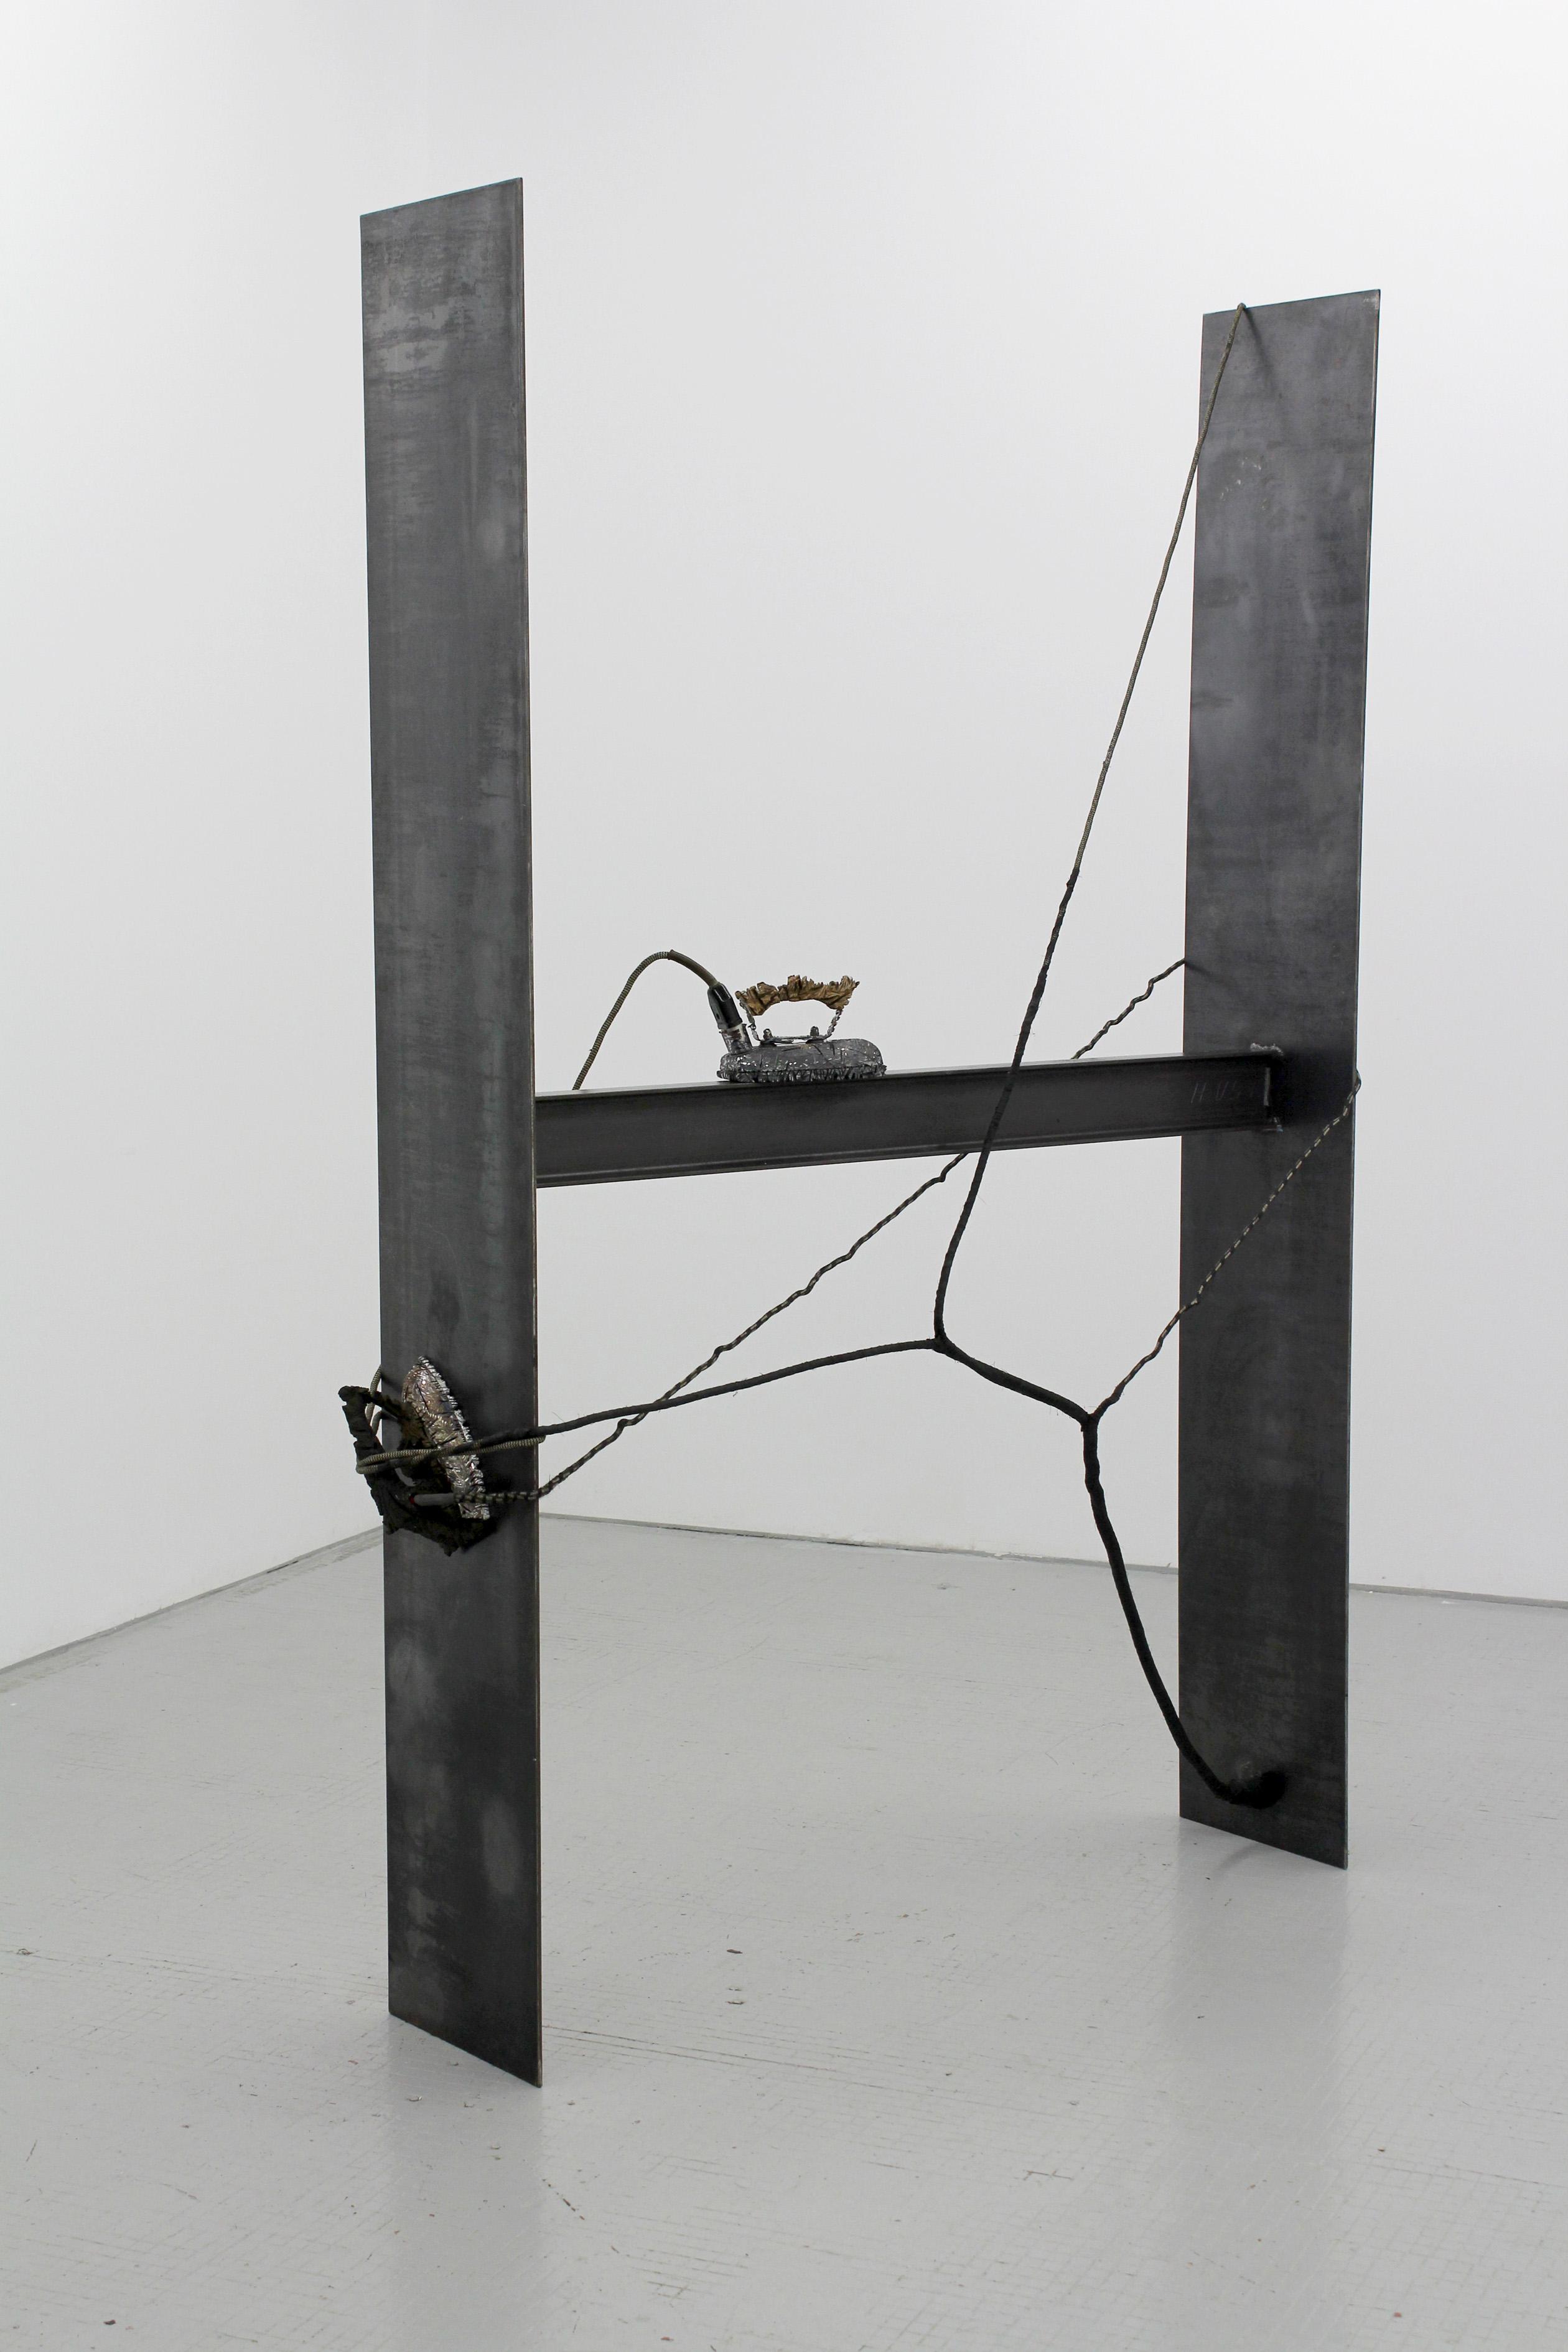 Roman Stańczak, Static Oblivion, 2015